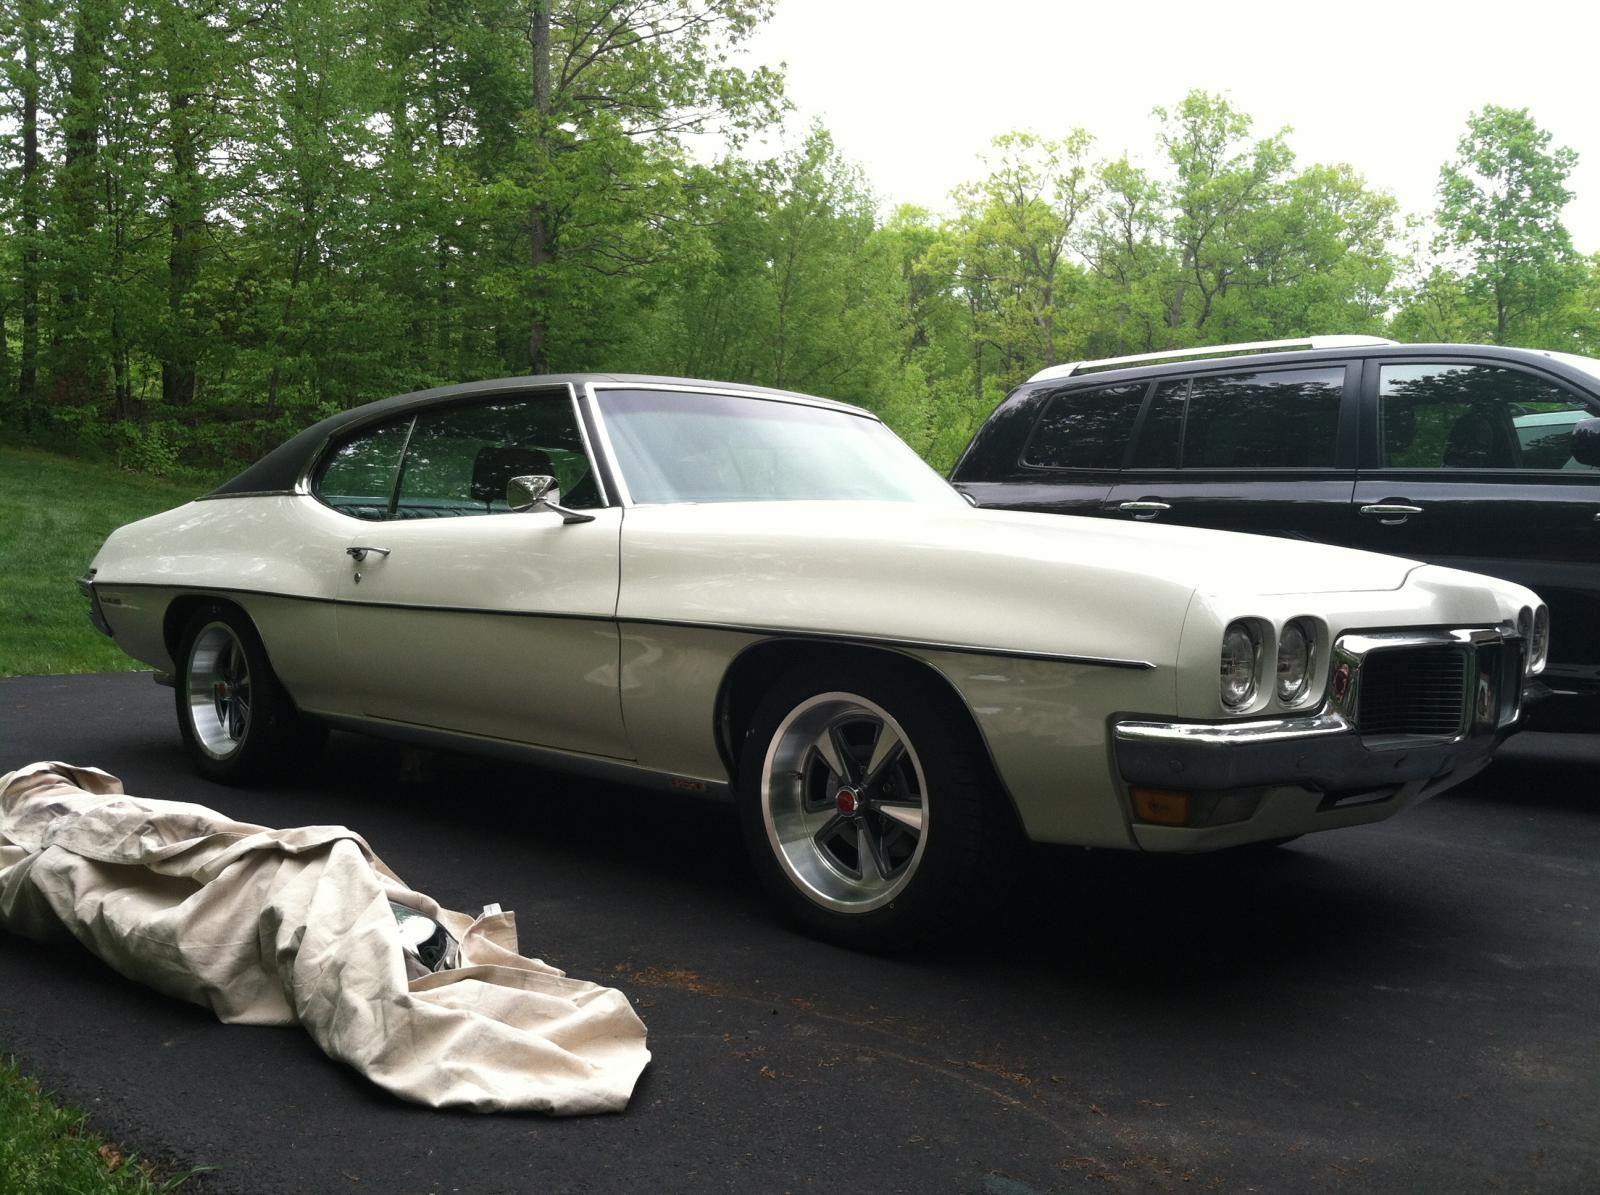 Pontiac rally ii aluminum 17x9 wheels